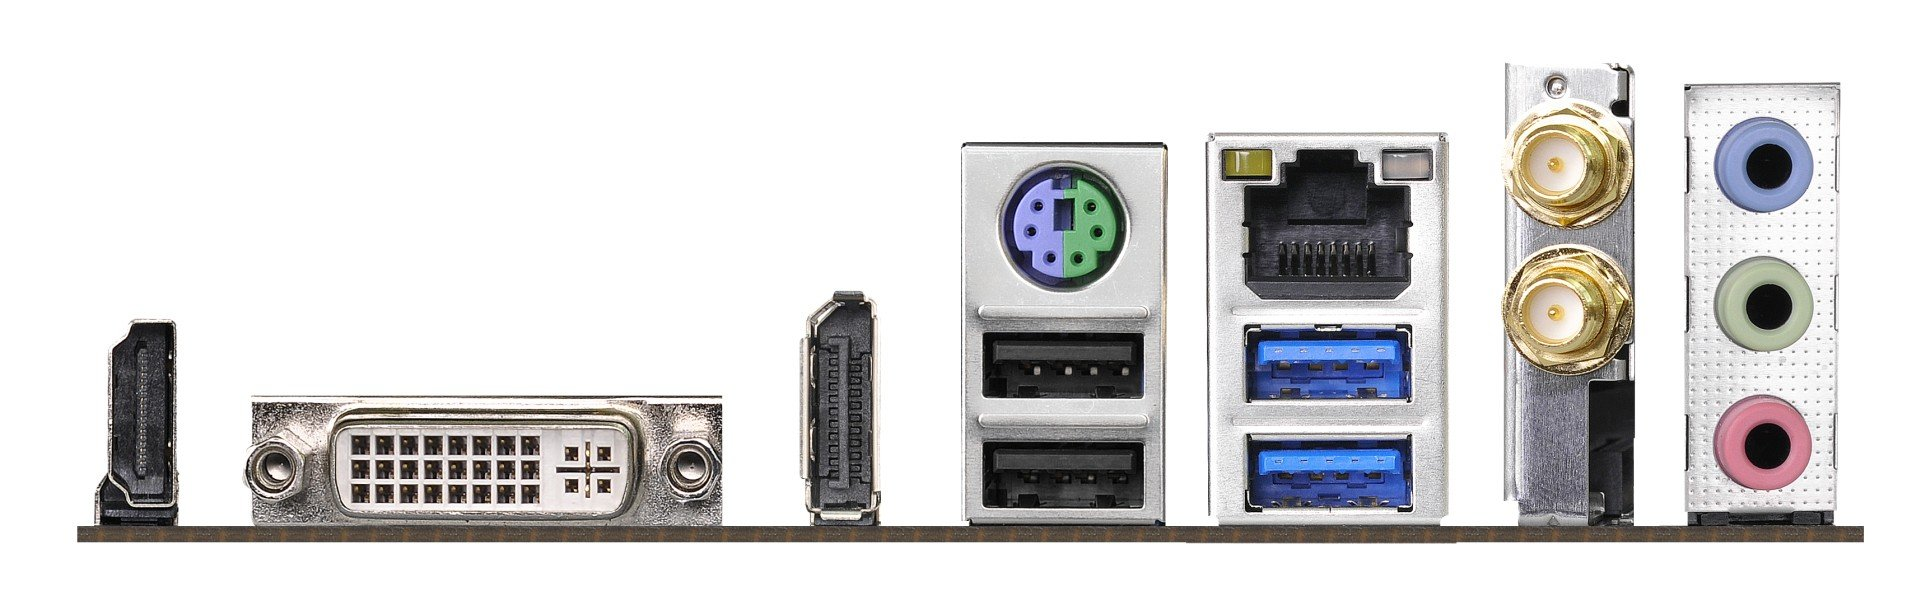 ASRock H310M-ITX ac